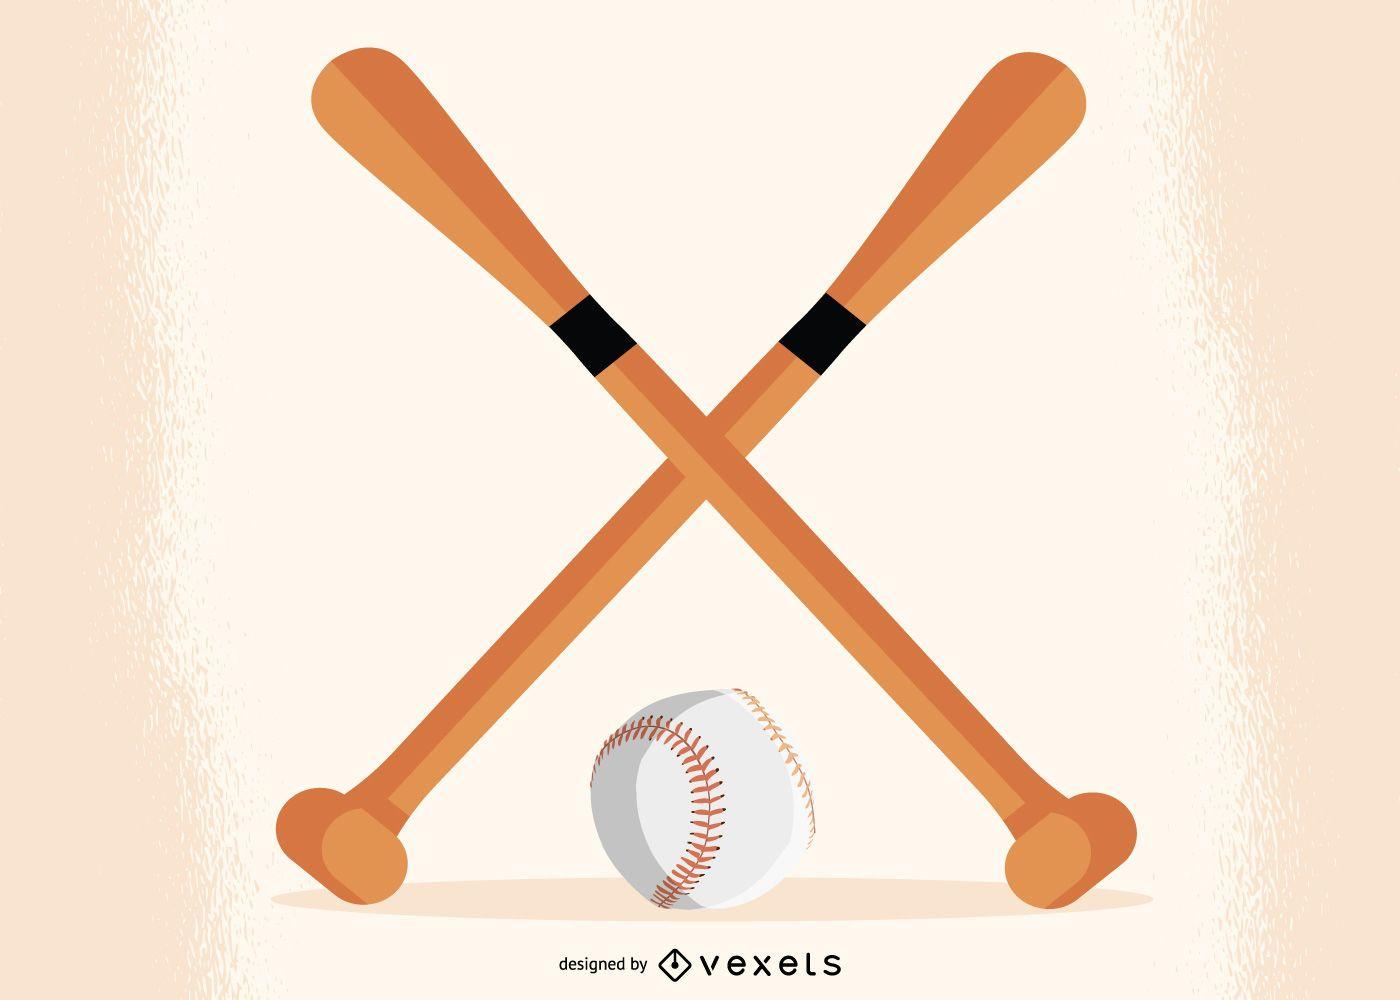 Crossed Baseball Bats with Ball Beneath